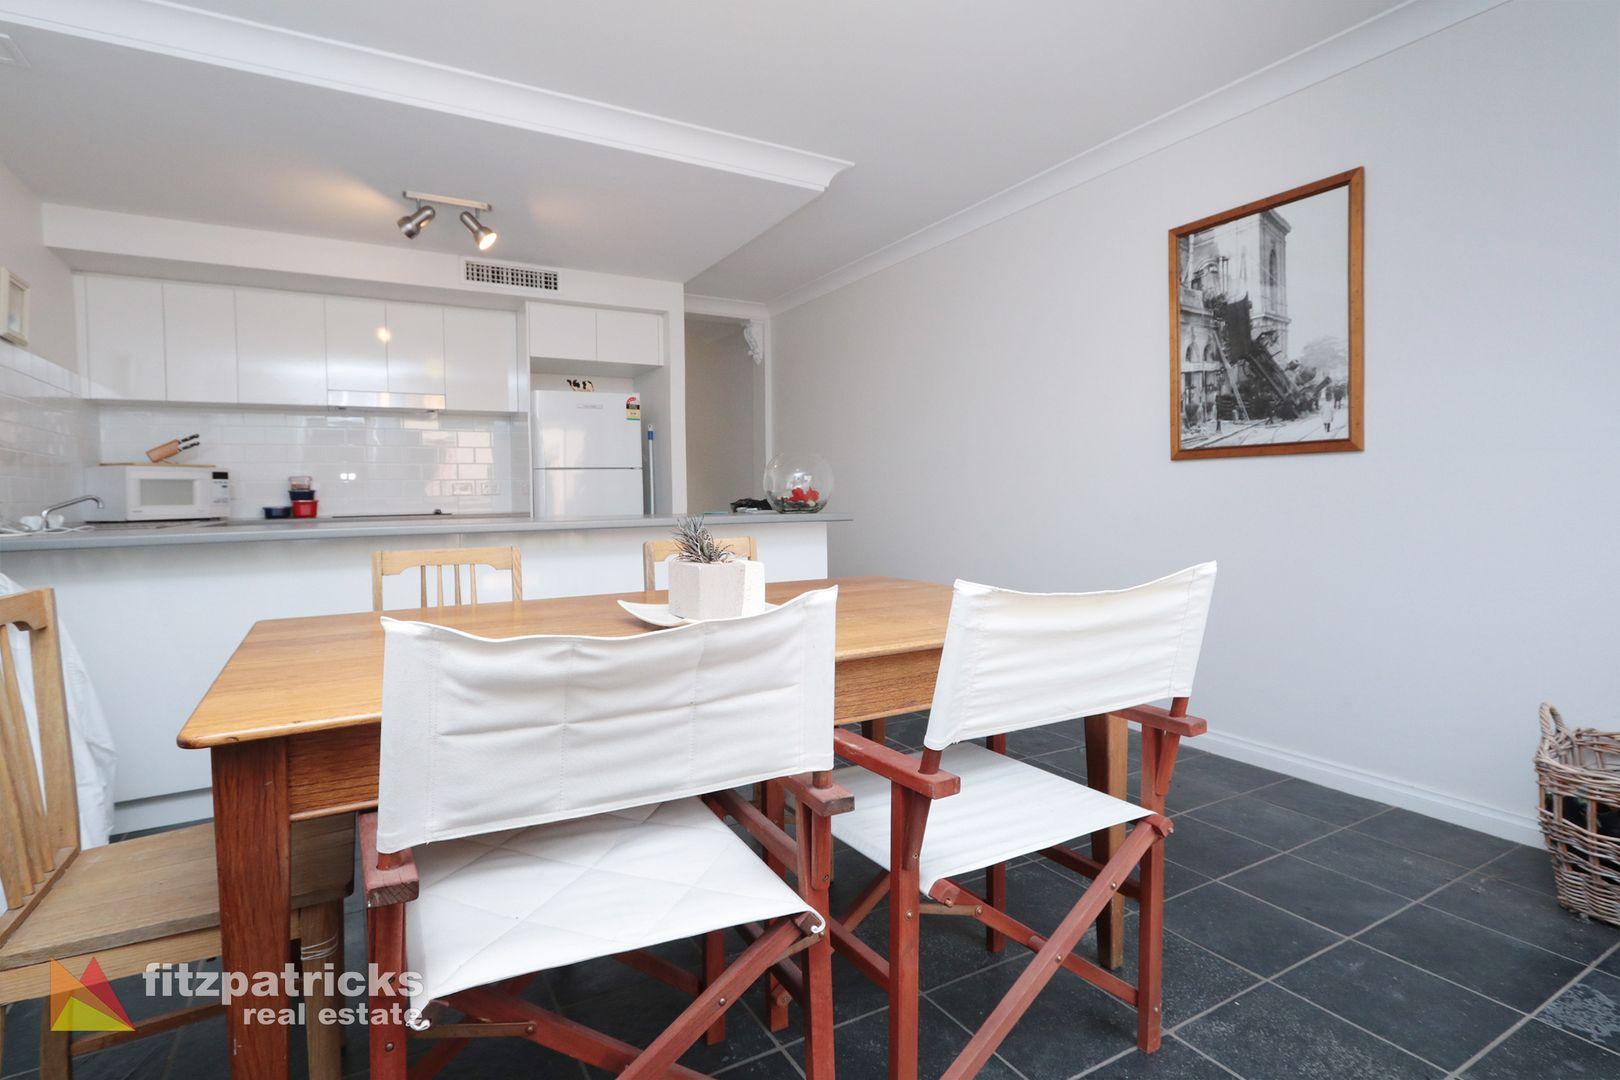 3/200 Fitzmaurice Street, Wagga Wagga NSW 2650, Image 2